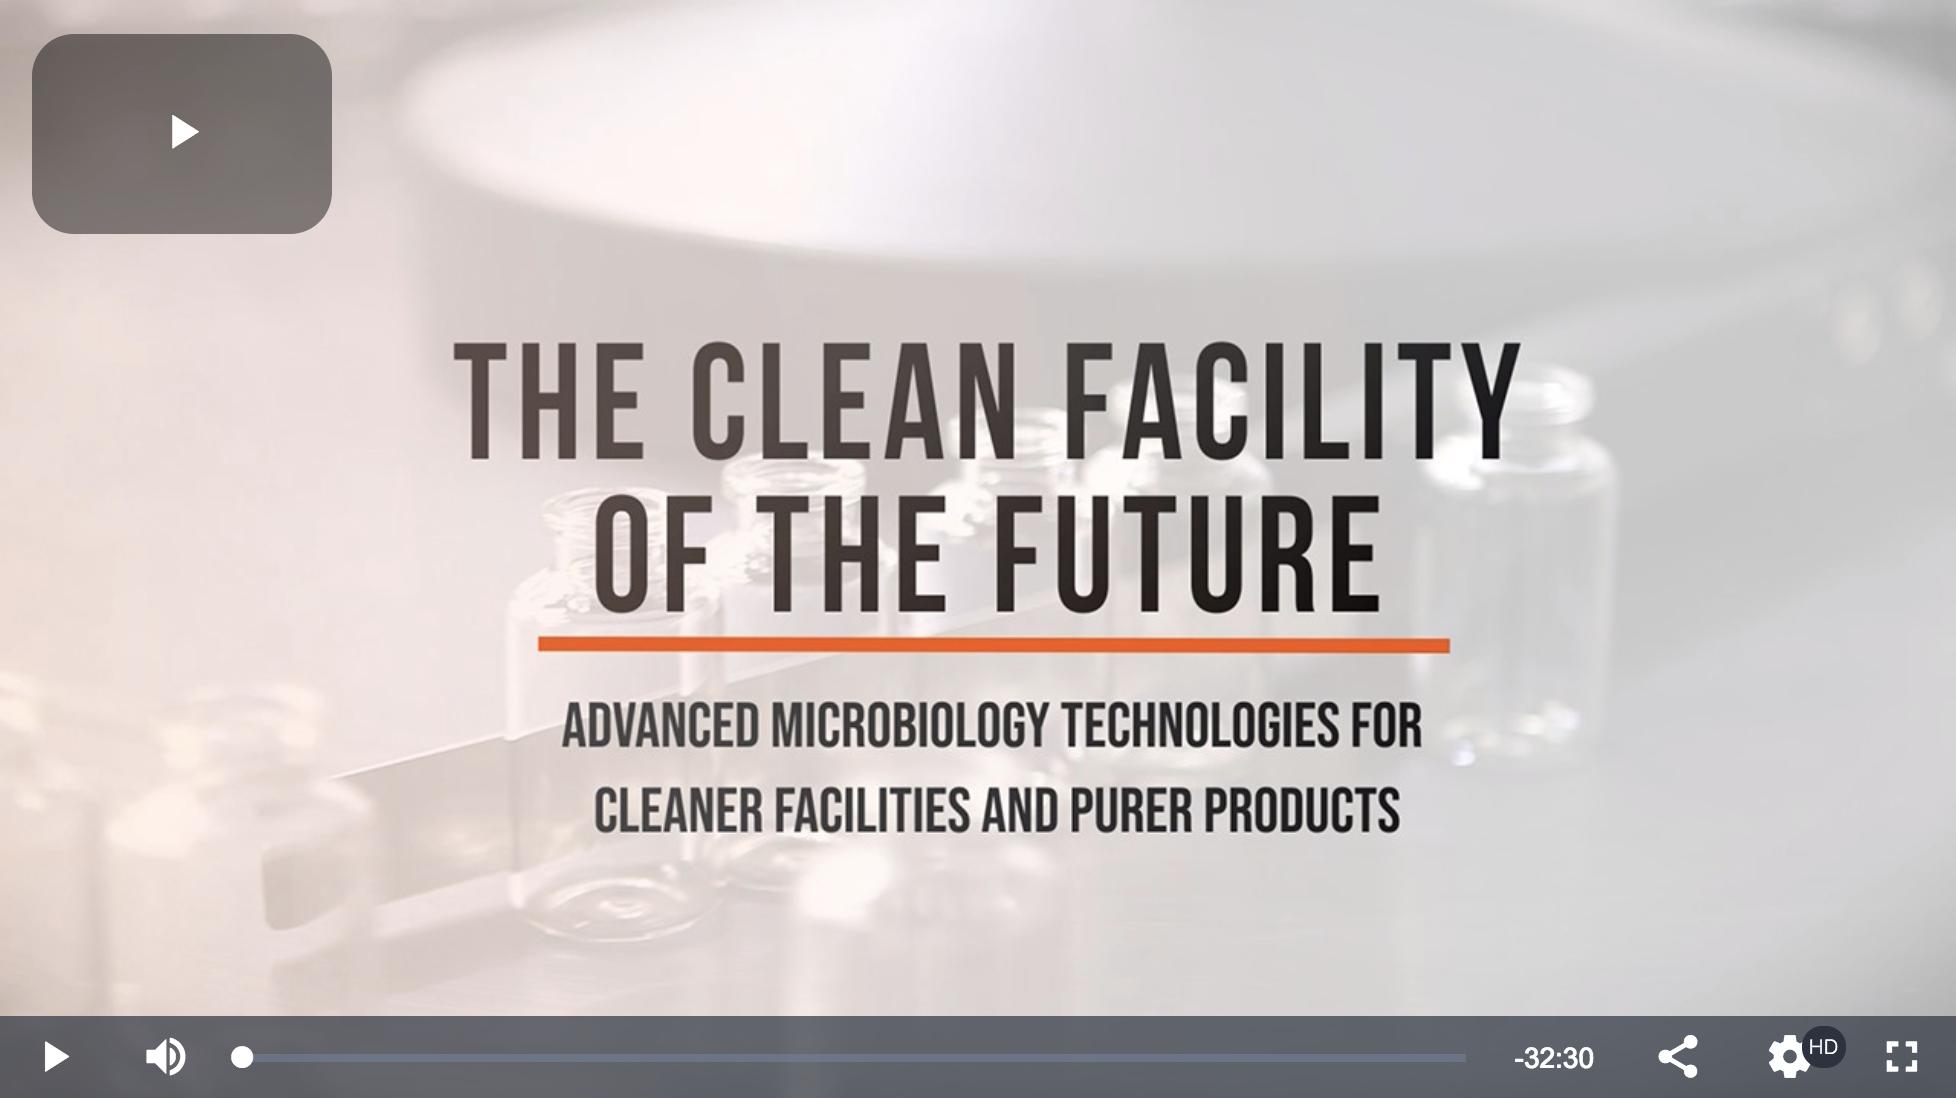 Facility of the Future Documentary